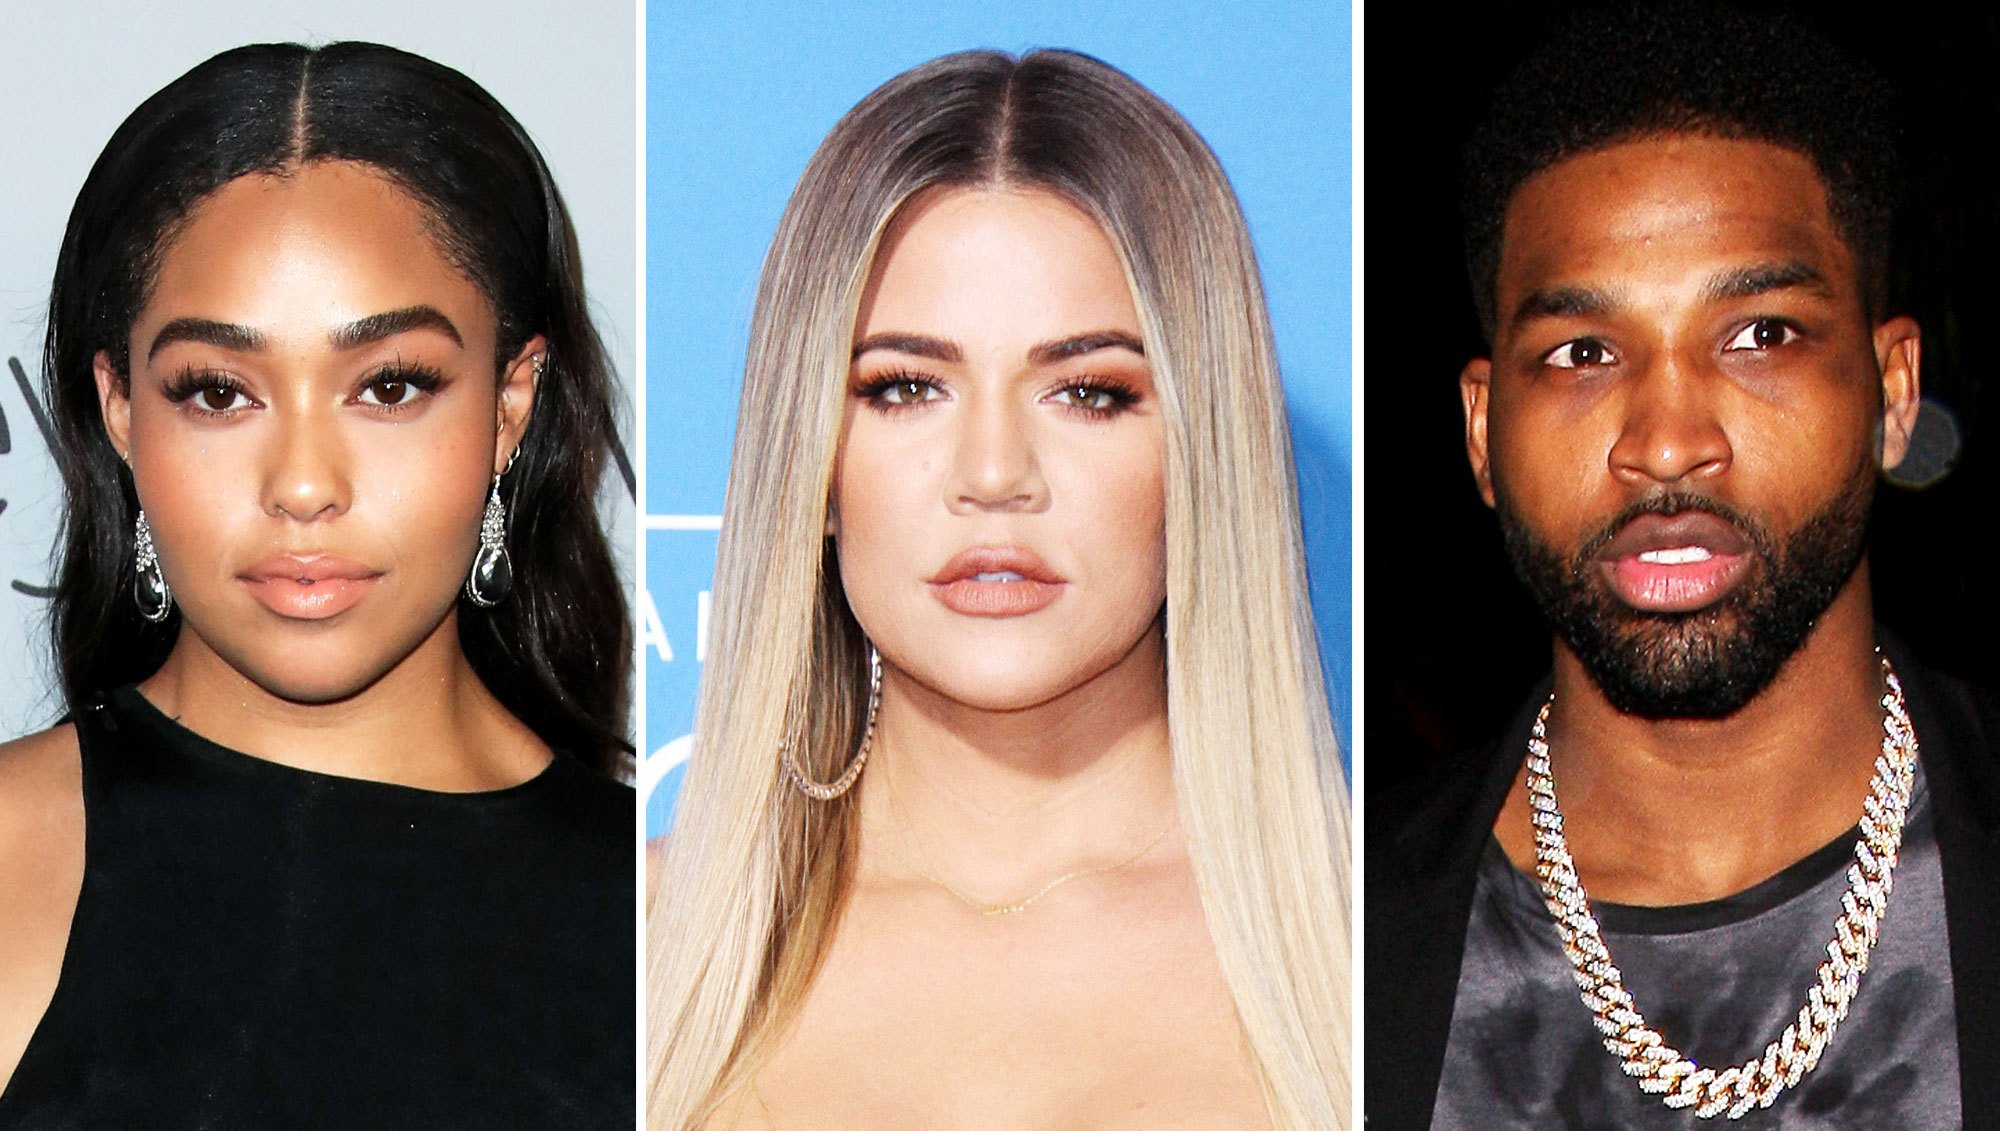 Jordyn Woods Preemptively Called Khloe Kardashian the Morning After Tristan Thompson Hookup